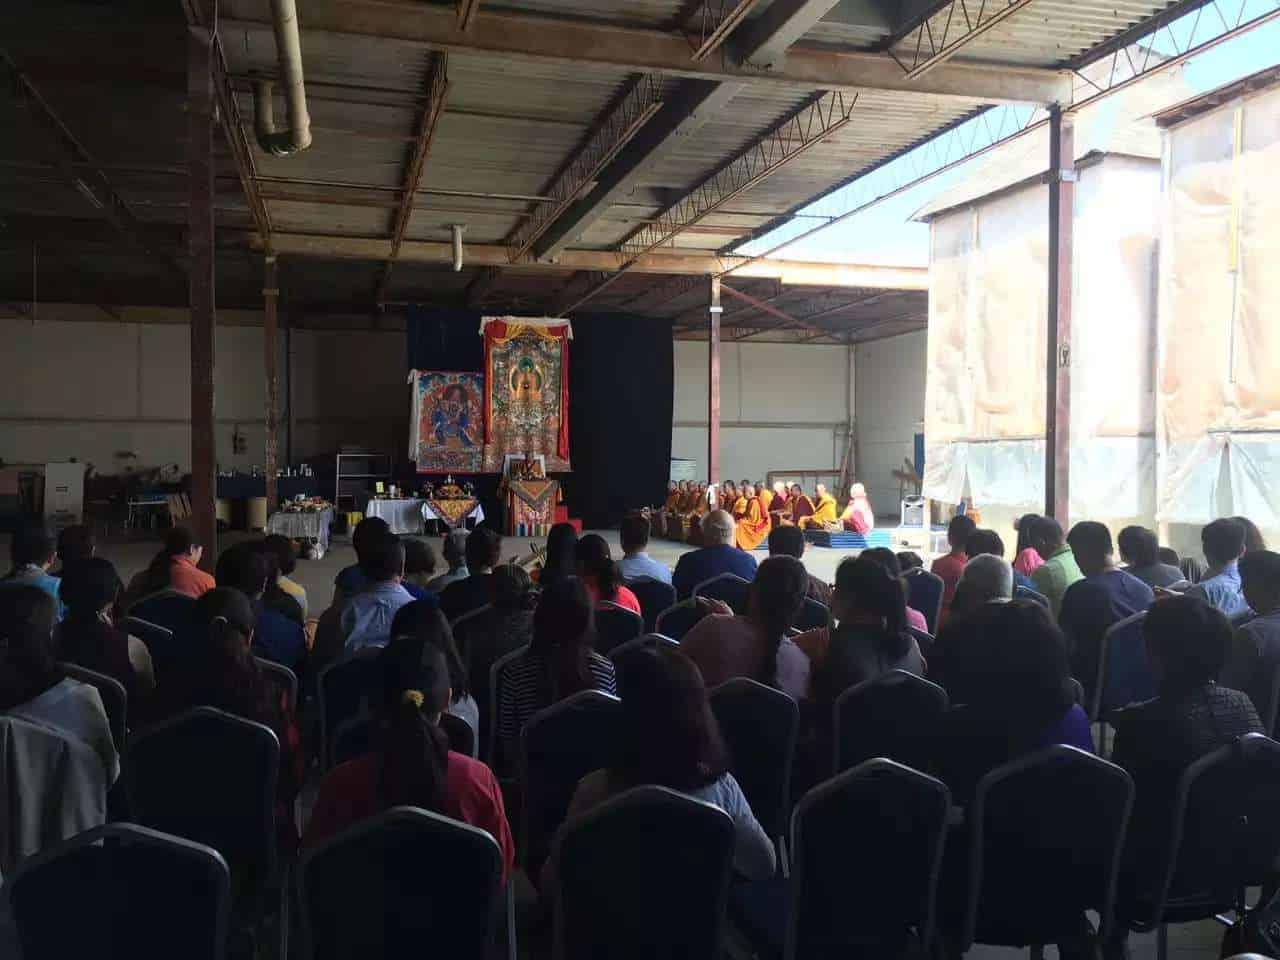 gosok-rinpoche-toronto-2016-4317b5e8672065ce2097e3d64d0eace